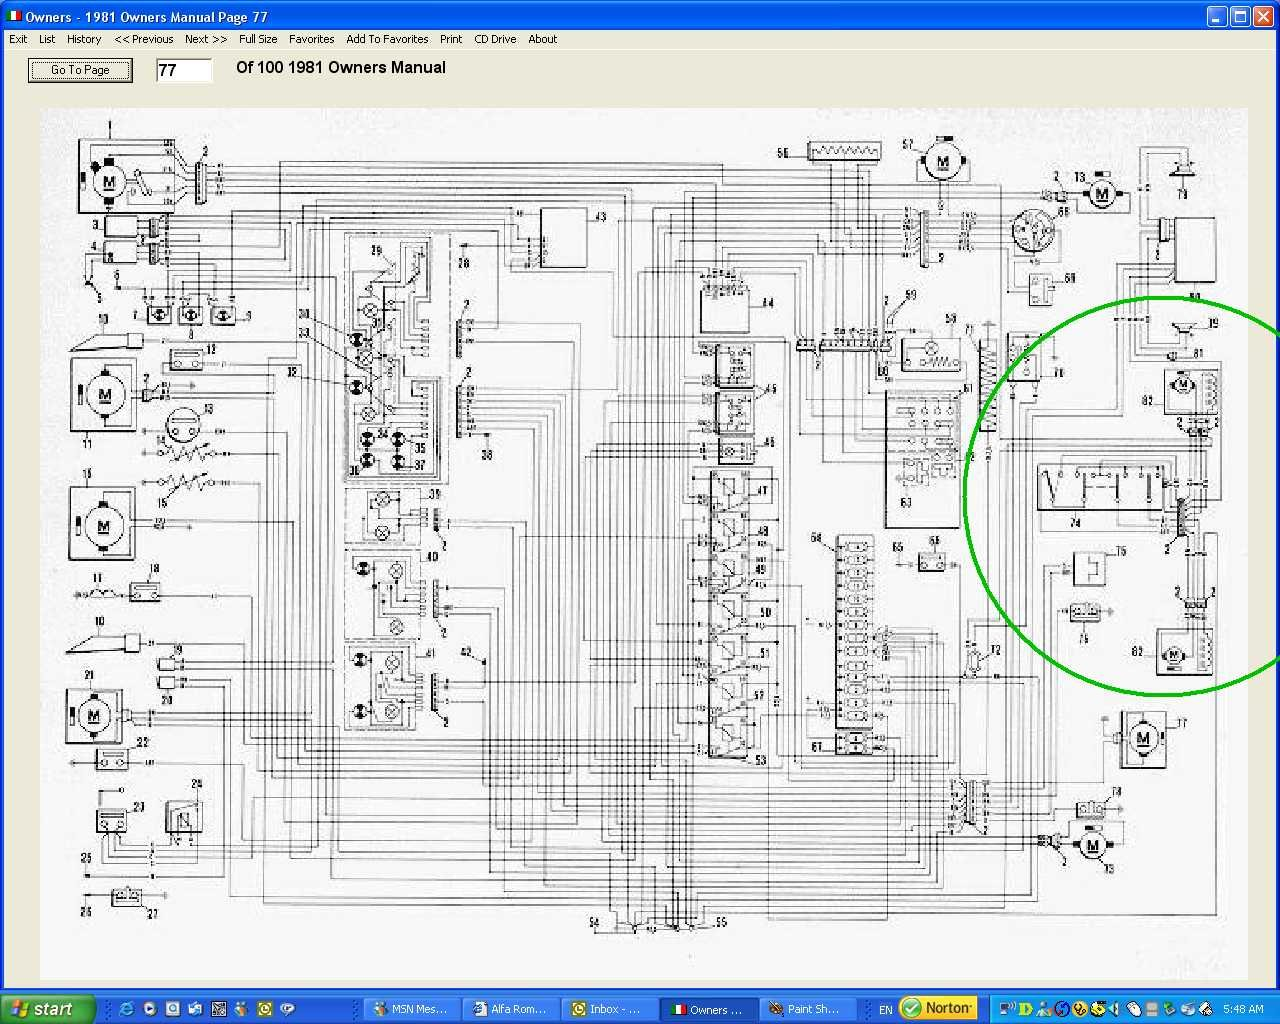 alfa romeo 156 electrical wiring diagram alfa alfa romeo mito wiring diagram alfa wiring diagrams online on alfa romeo 156 electrical wiring diagram